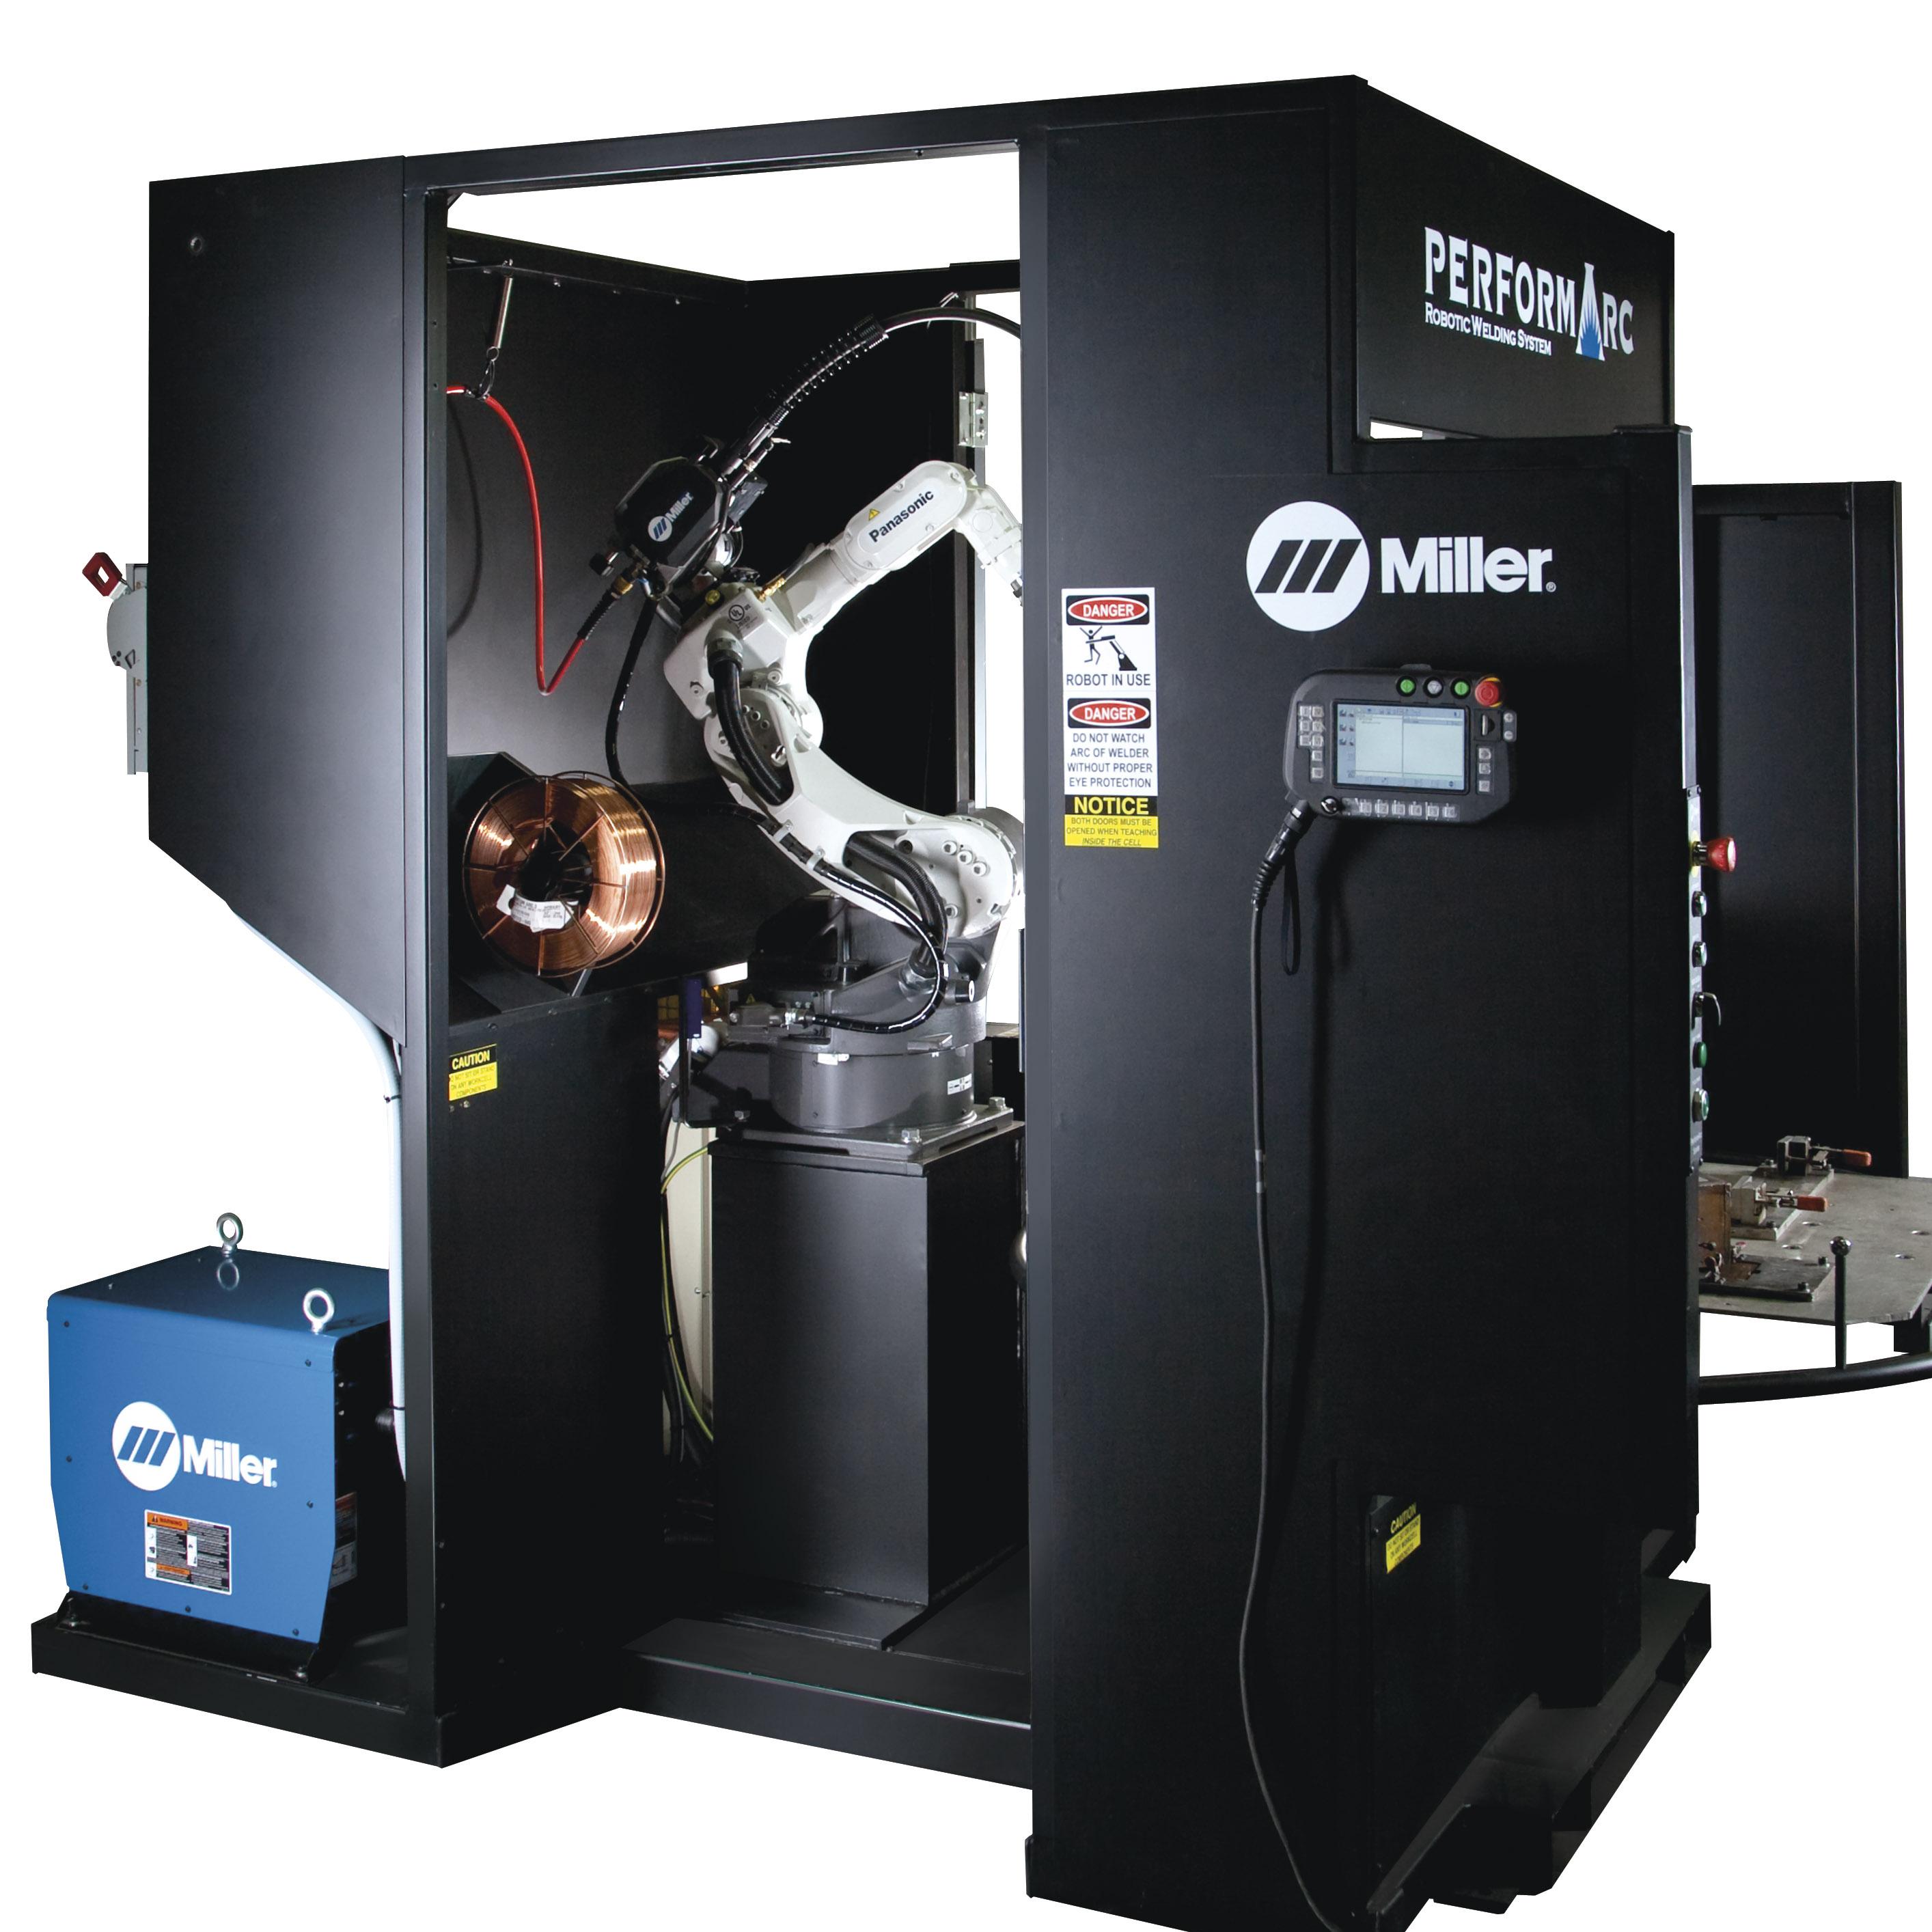 Miller Electric Perform Arc Robotics Automation Welding